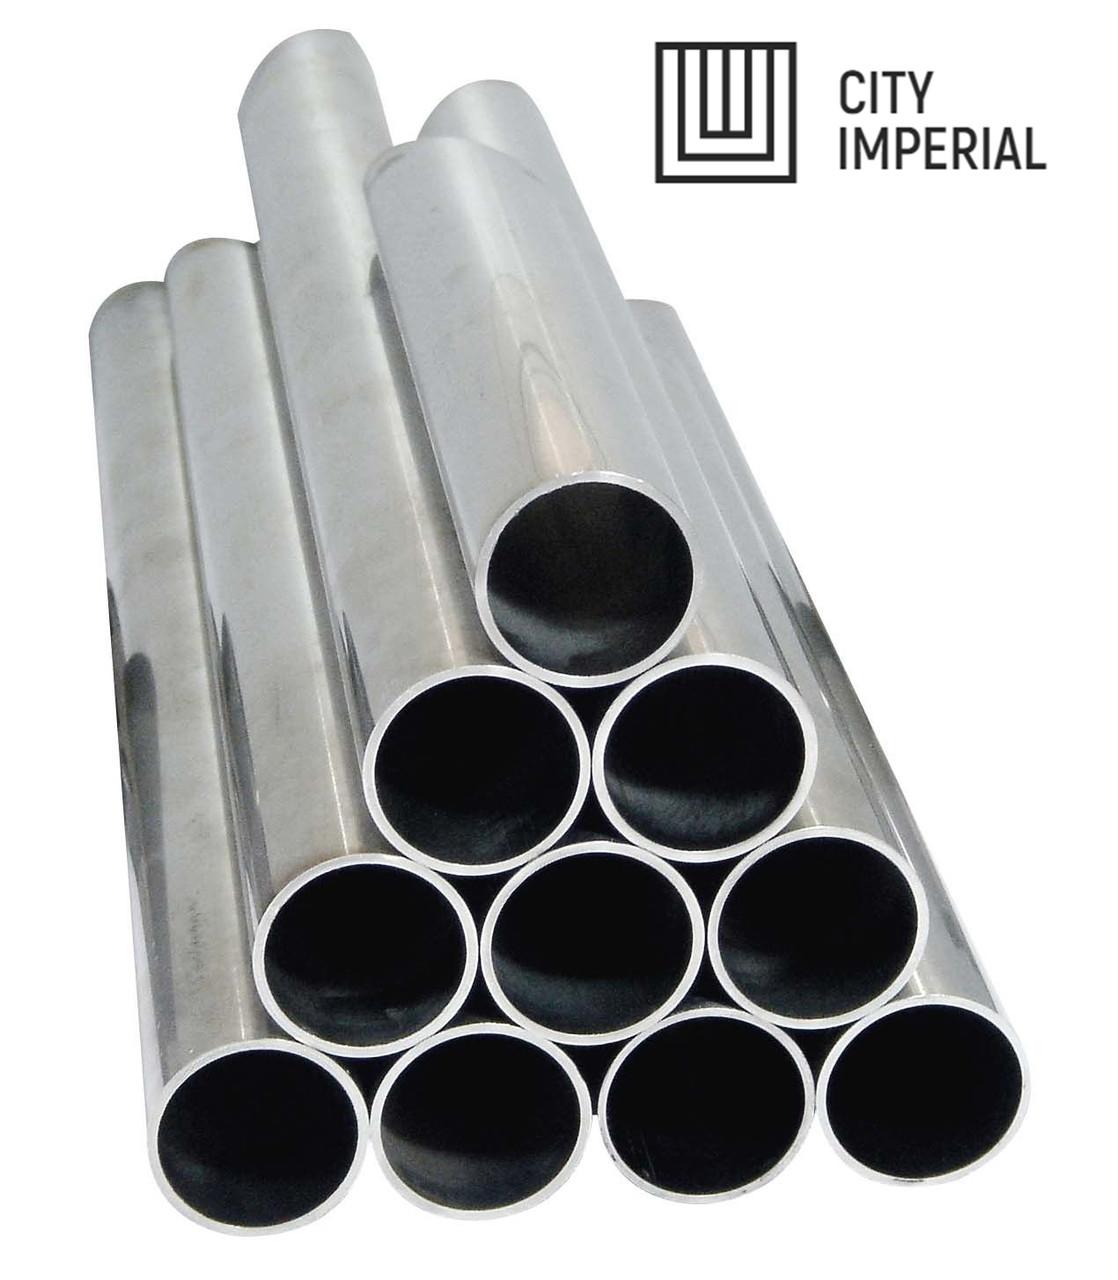 Труба 140 х 36 сталь 15Х1М1Ф